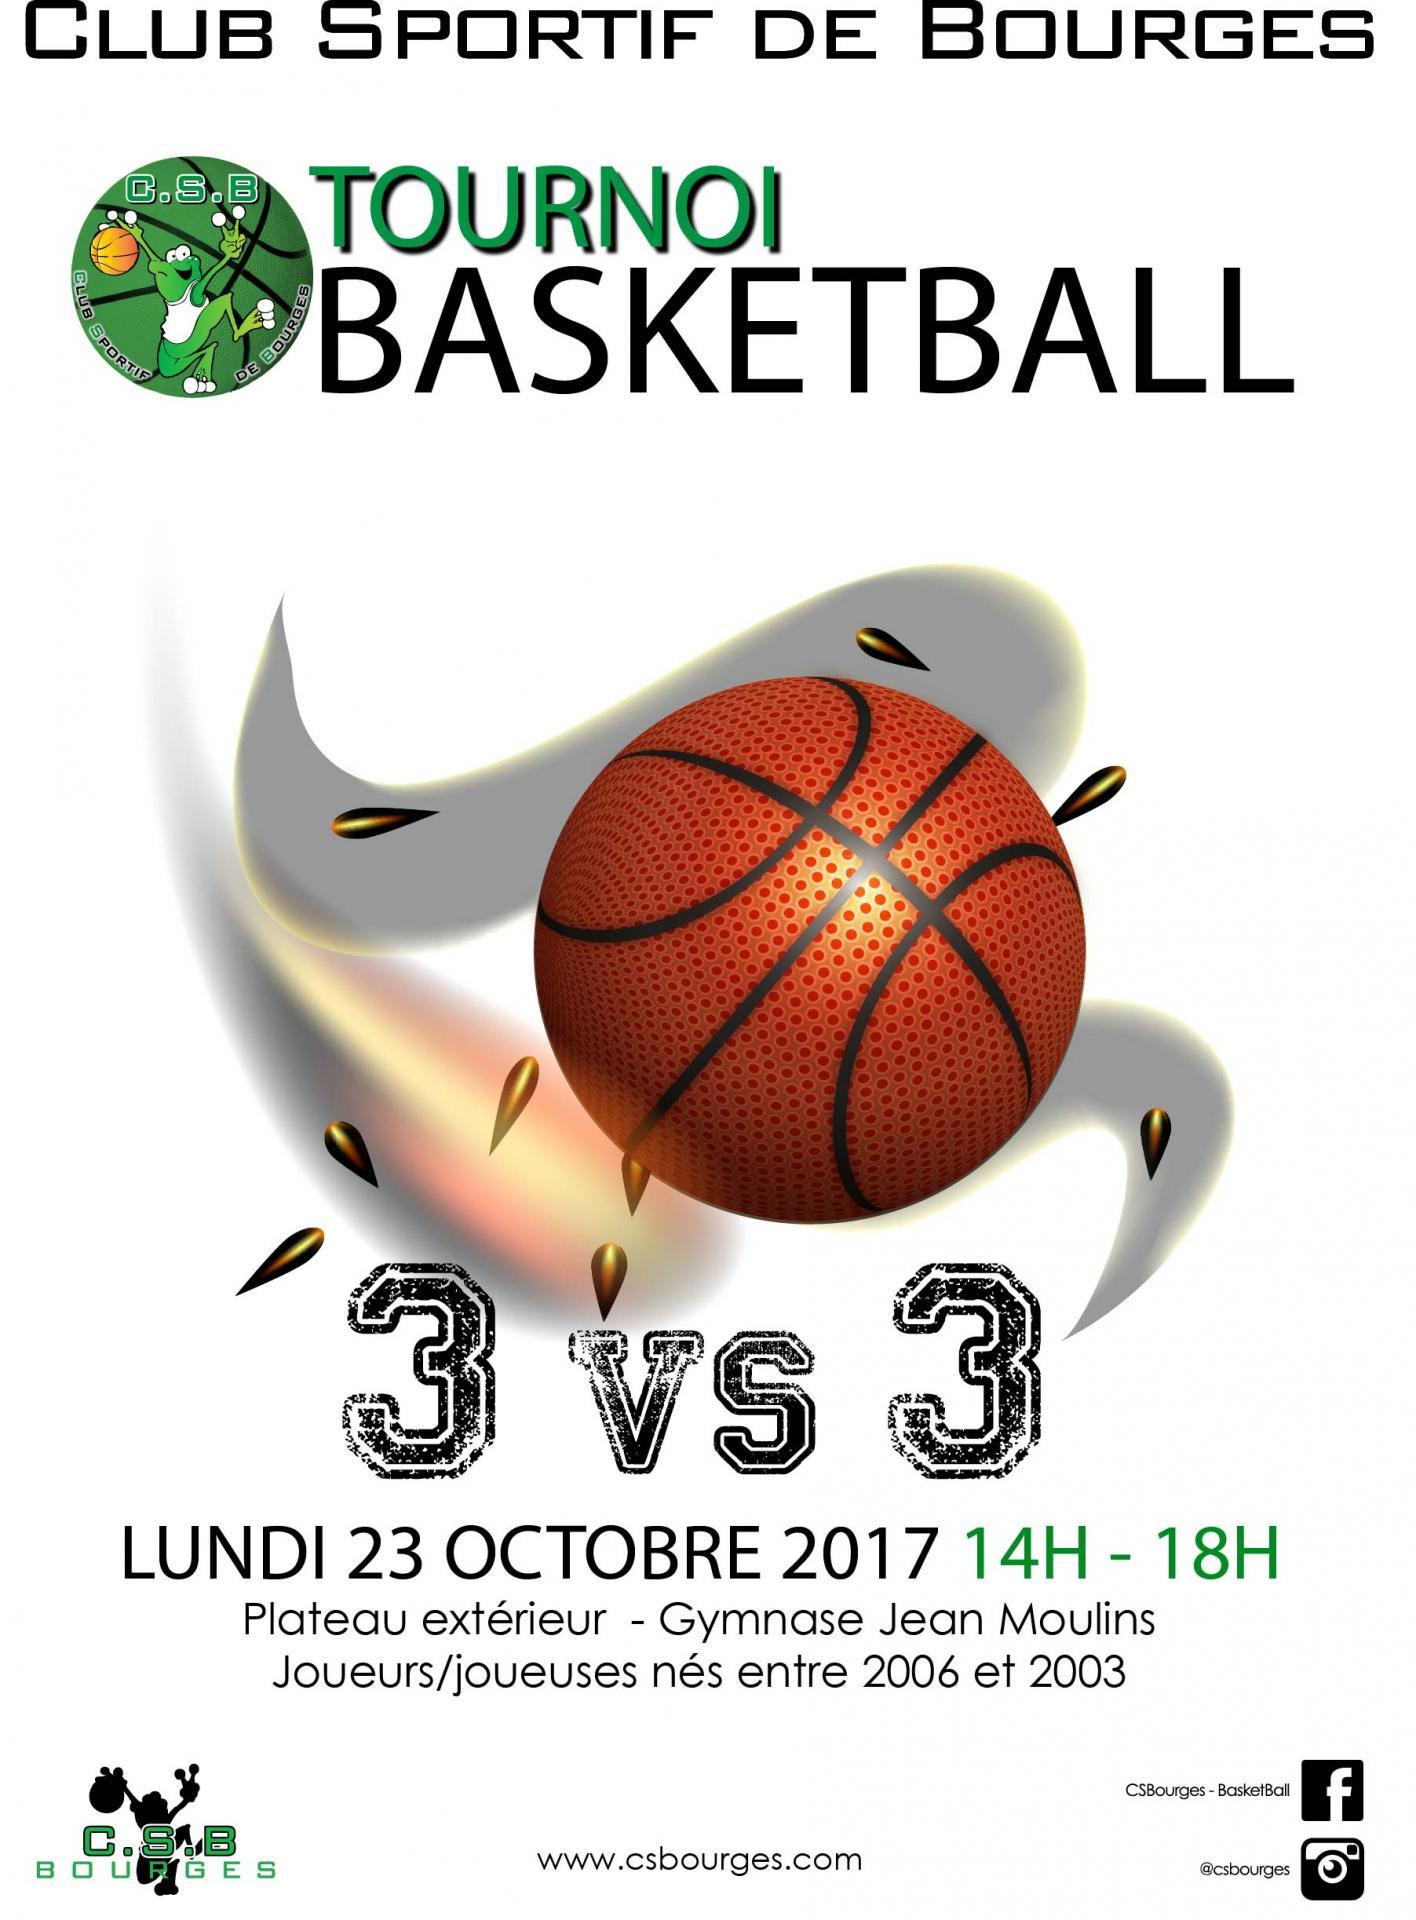 Tournoi octobre 2017 3x3 vblanche